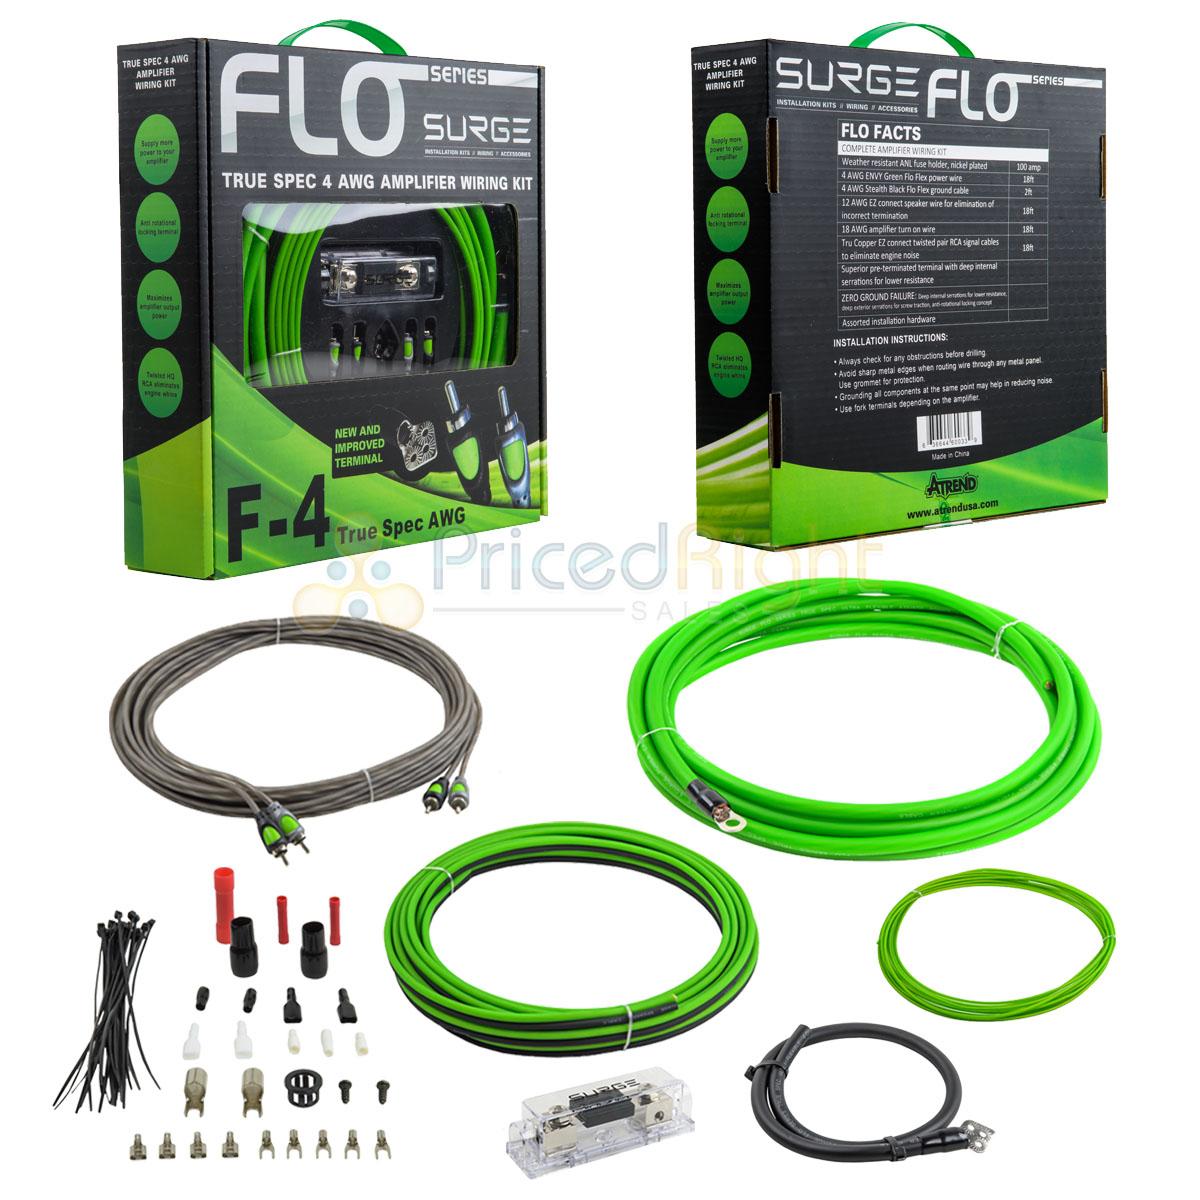 True 4 Gauge Amplifier Wiring Kit Green Amp Kit 4 AWG Flo Surge Atrend F-4